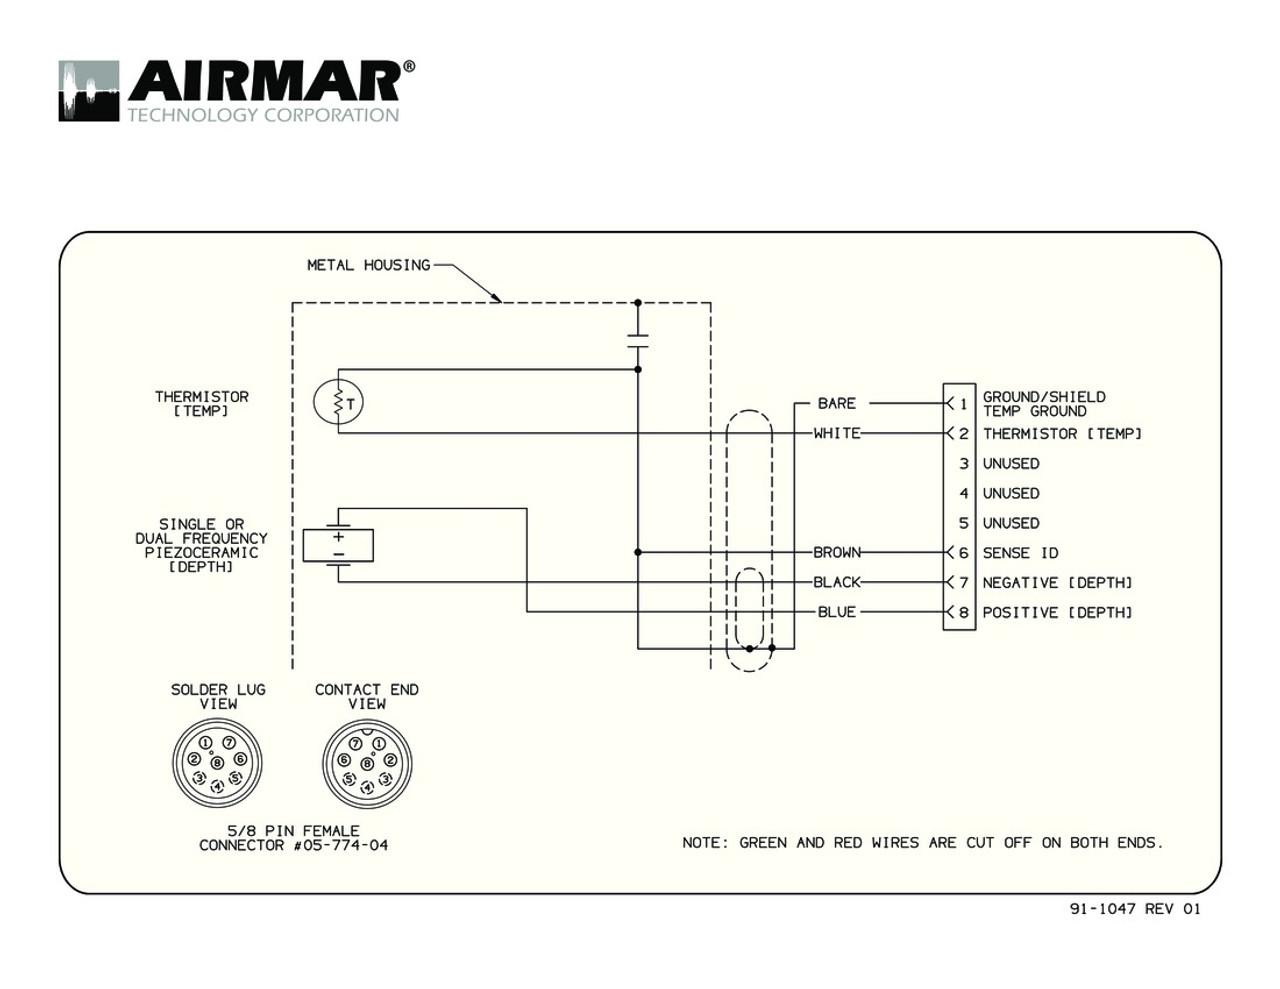 garmin radar wiring diagram wiring librarydepth u0026 temperature b117 transducers with garmin 8 pin connector [ 1280 x 989 Pixel ]